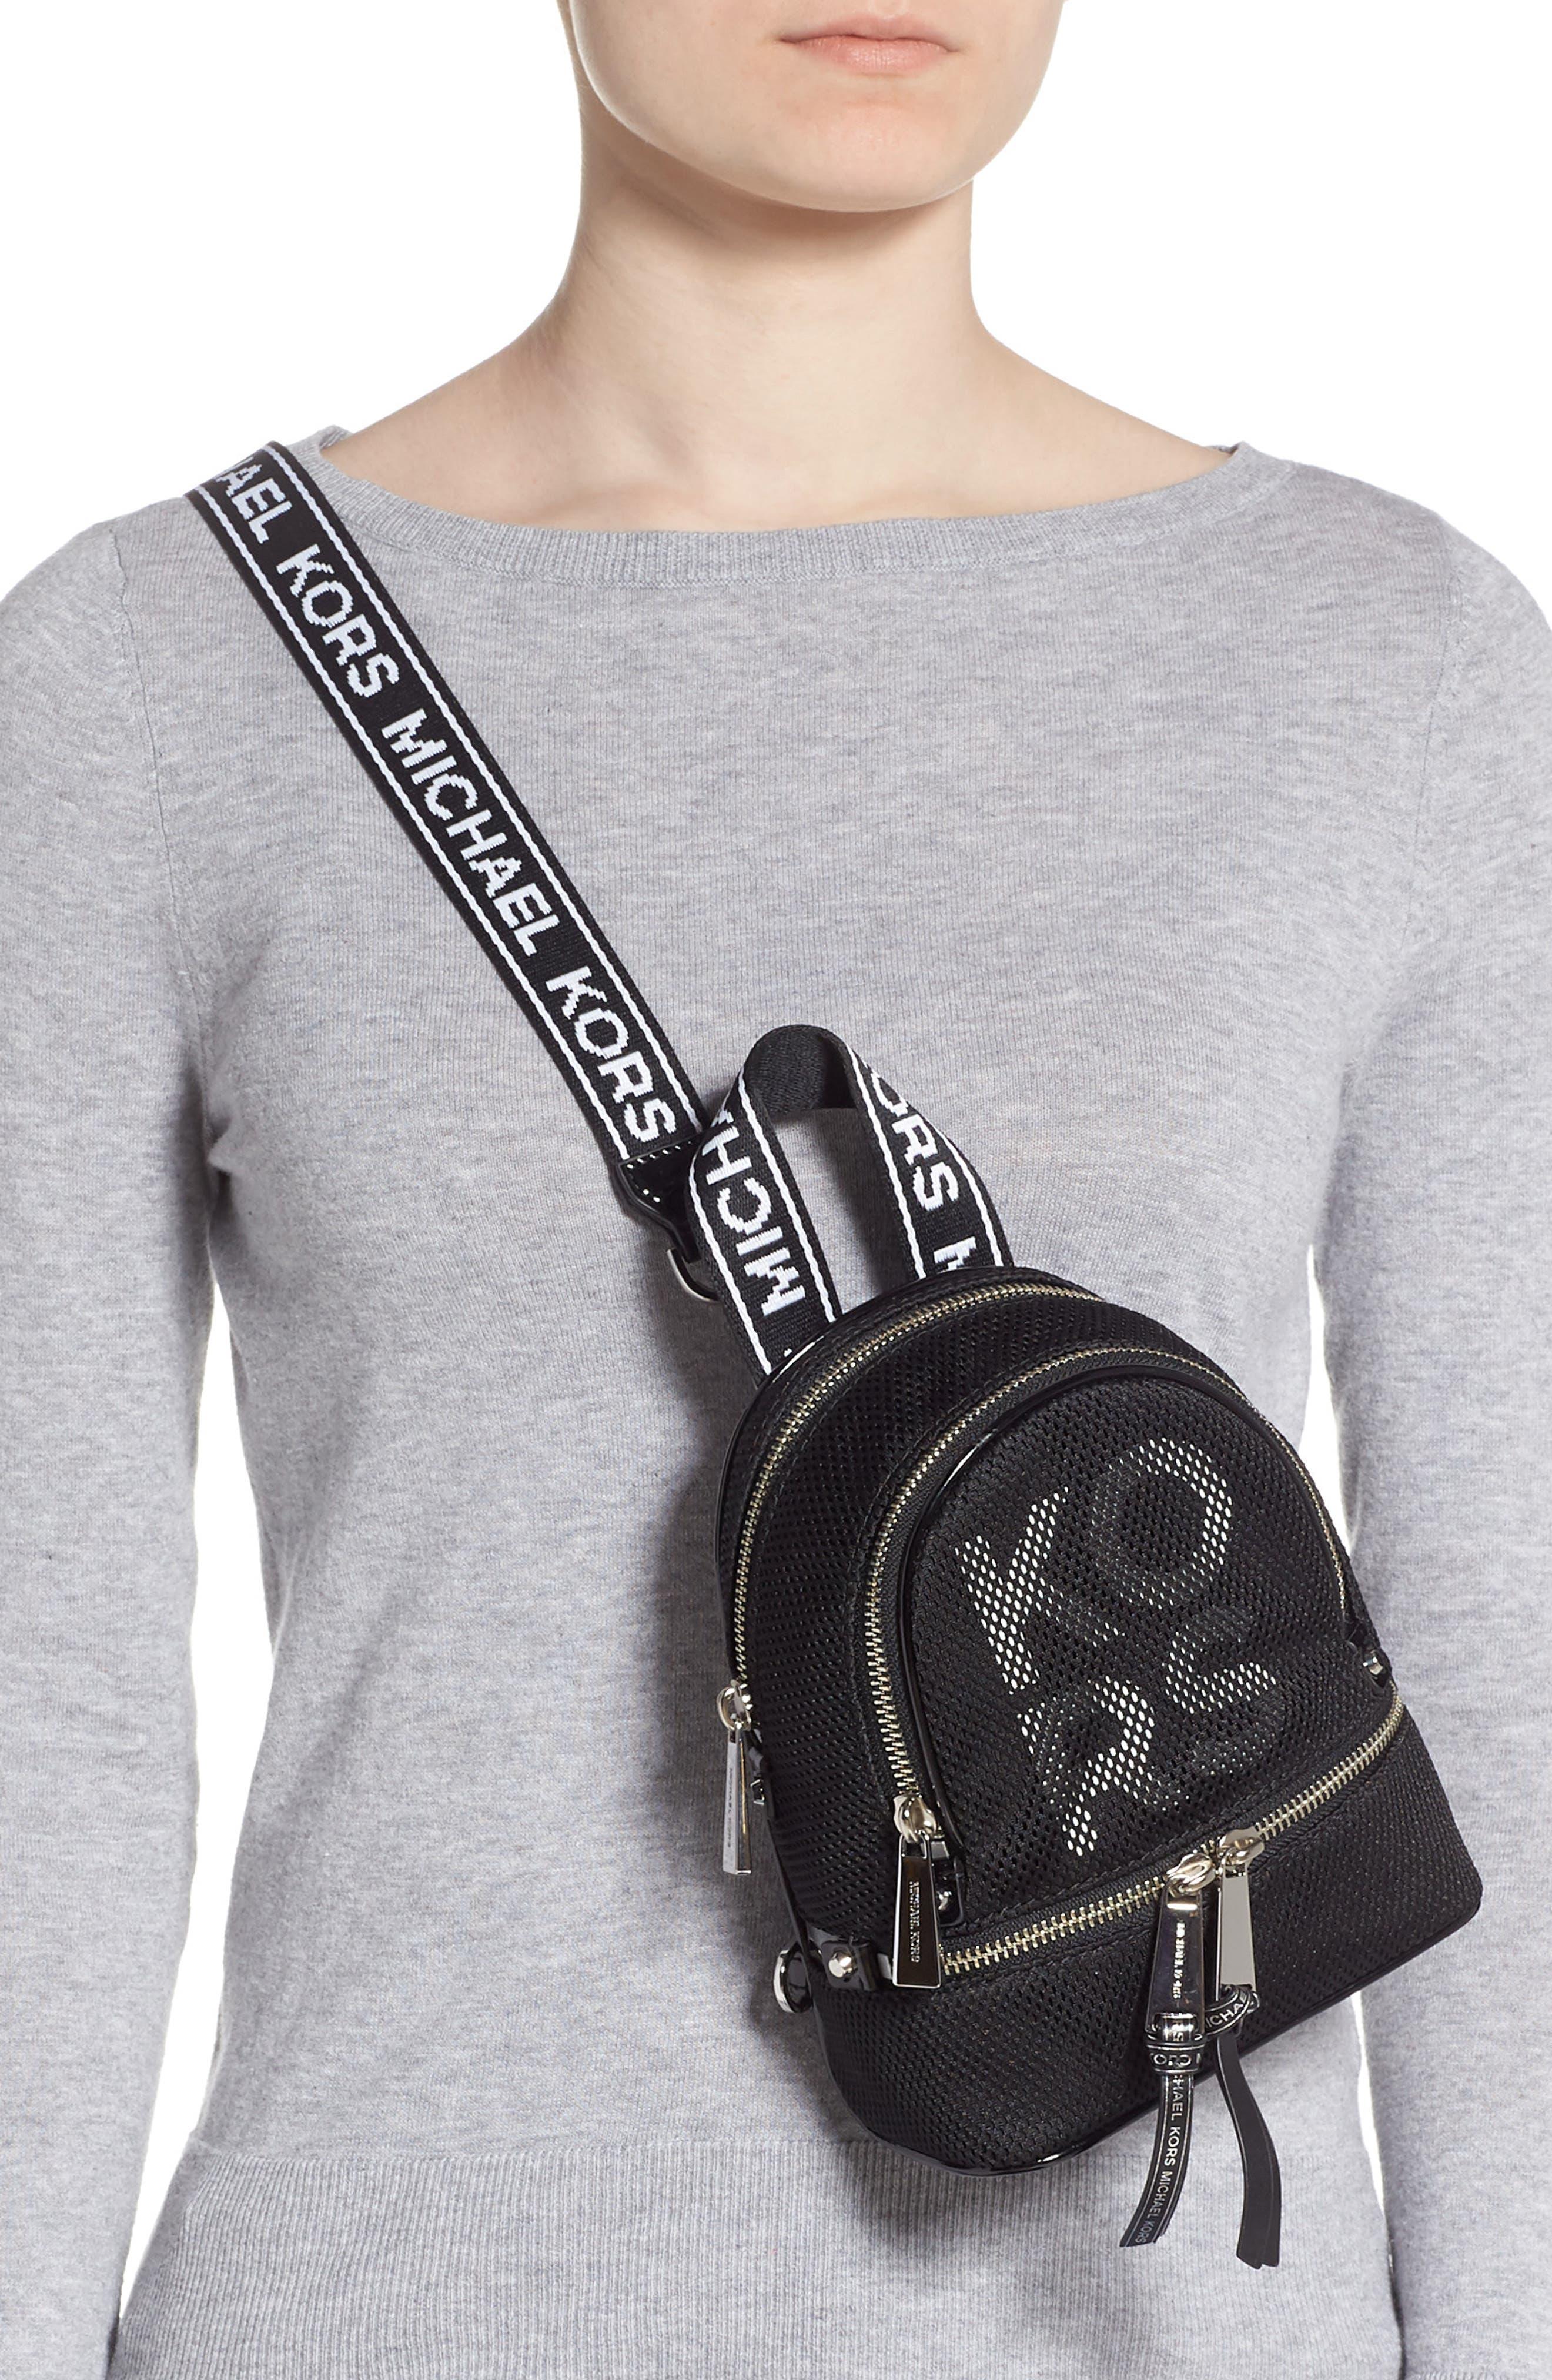 MICHAEL MICHAEL KORS, Extra Small Rhea Mesh Backpack, Alternate thumbnail 4, color, BLACK/ OPTIC WHITE